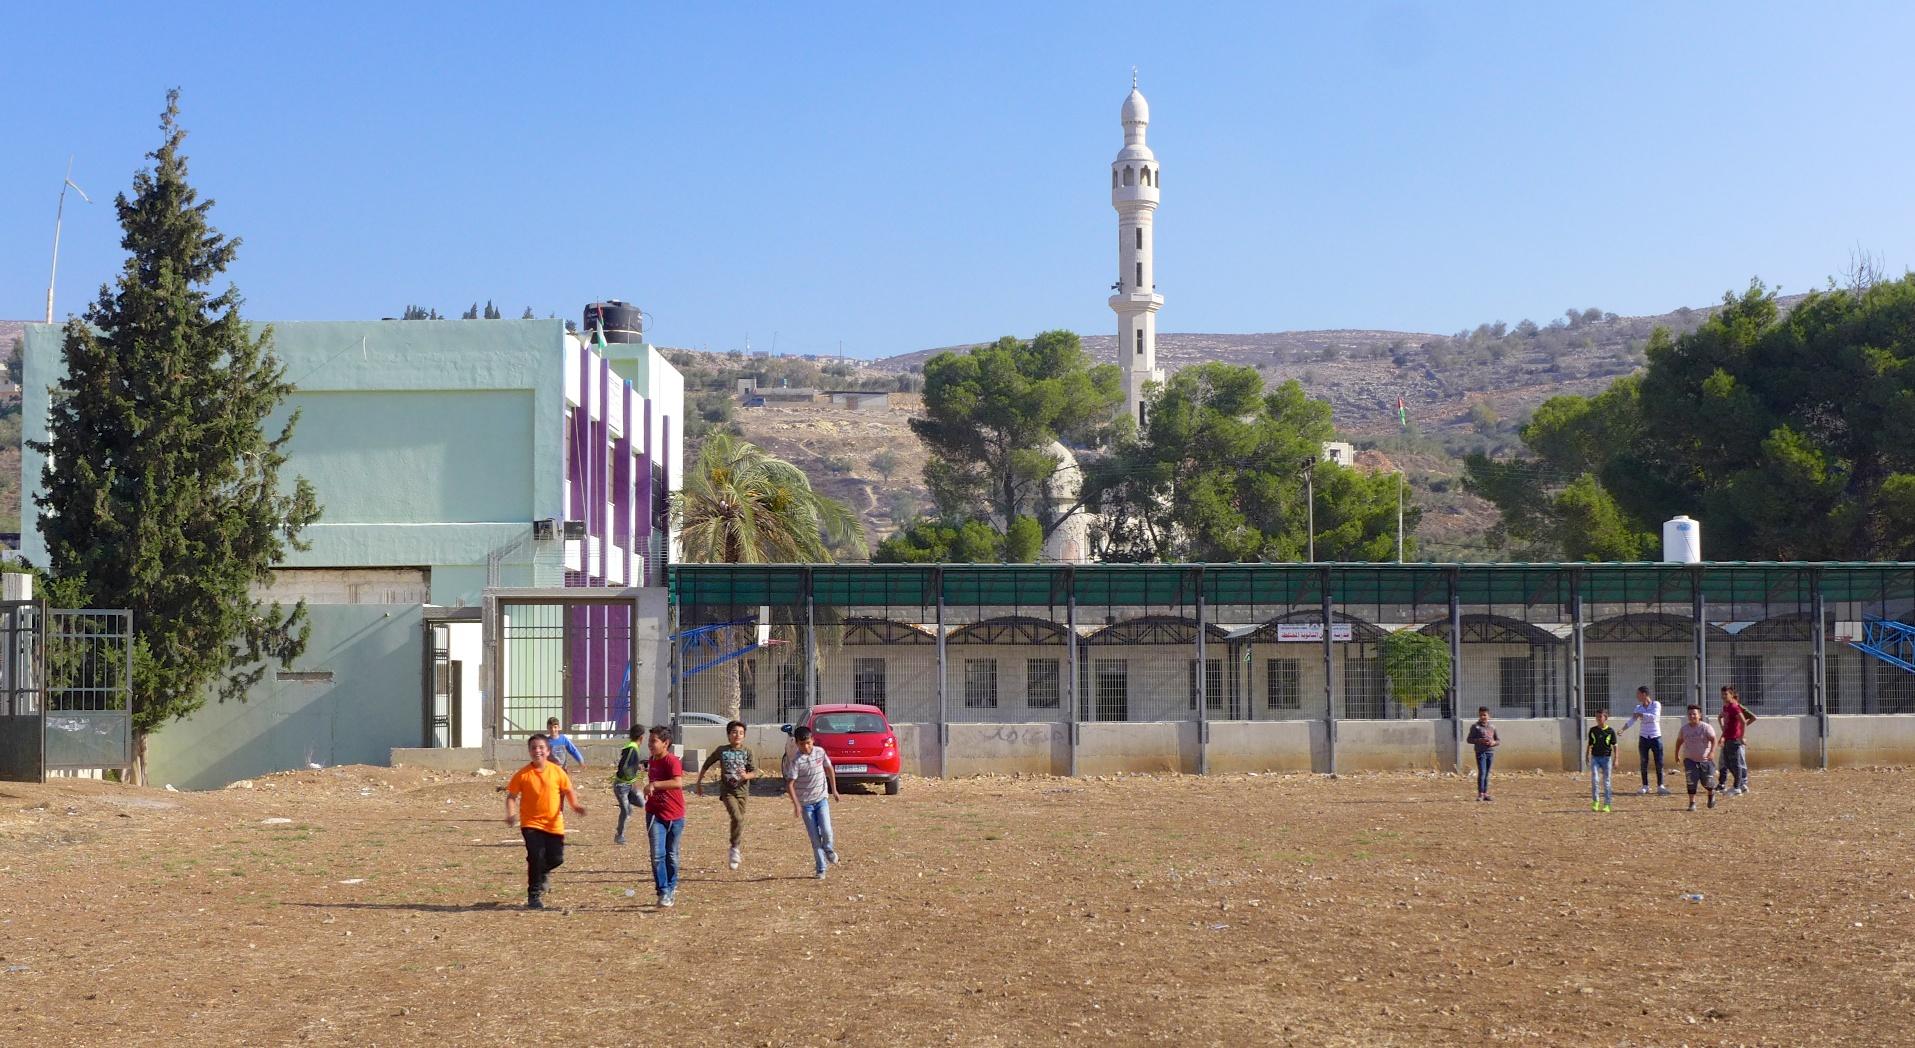 Burin community school